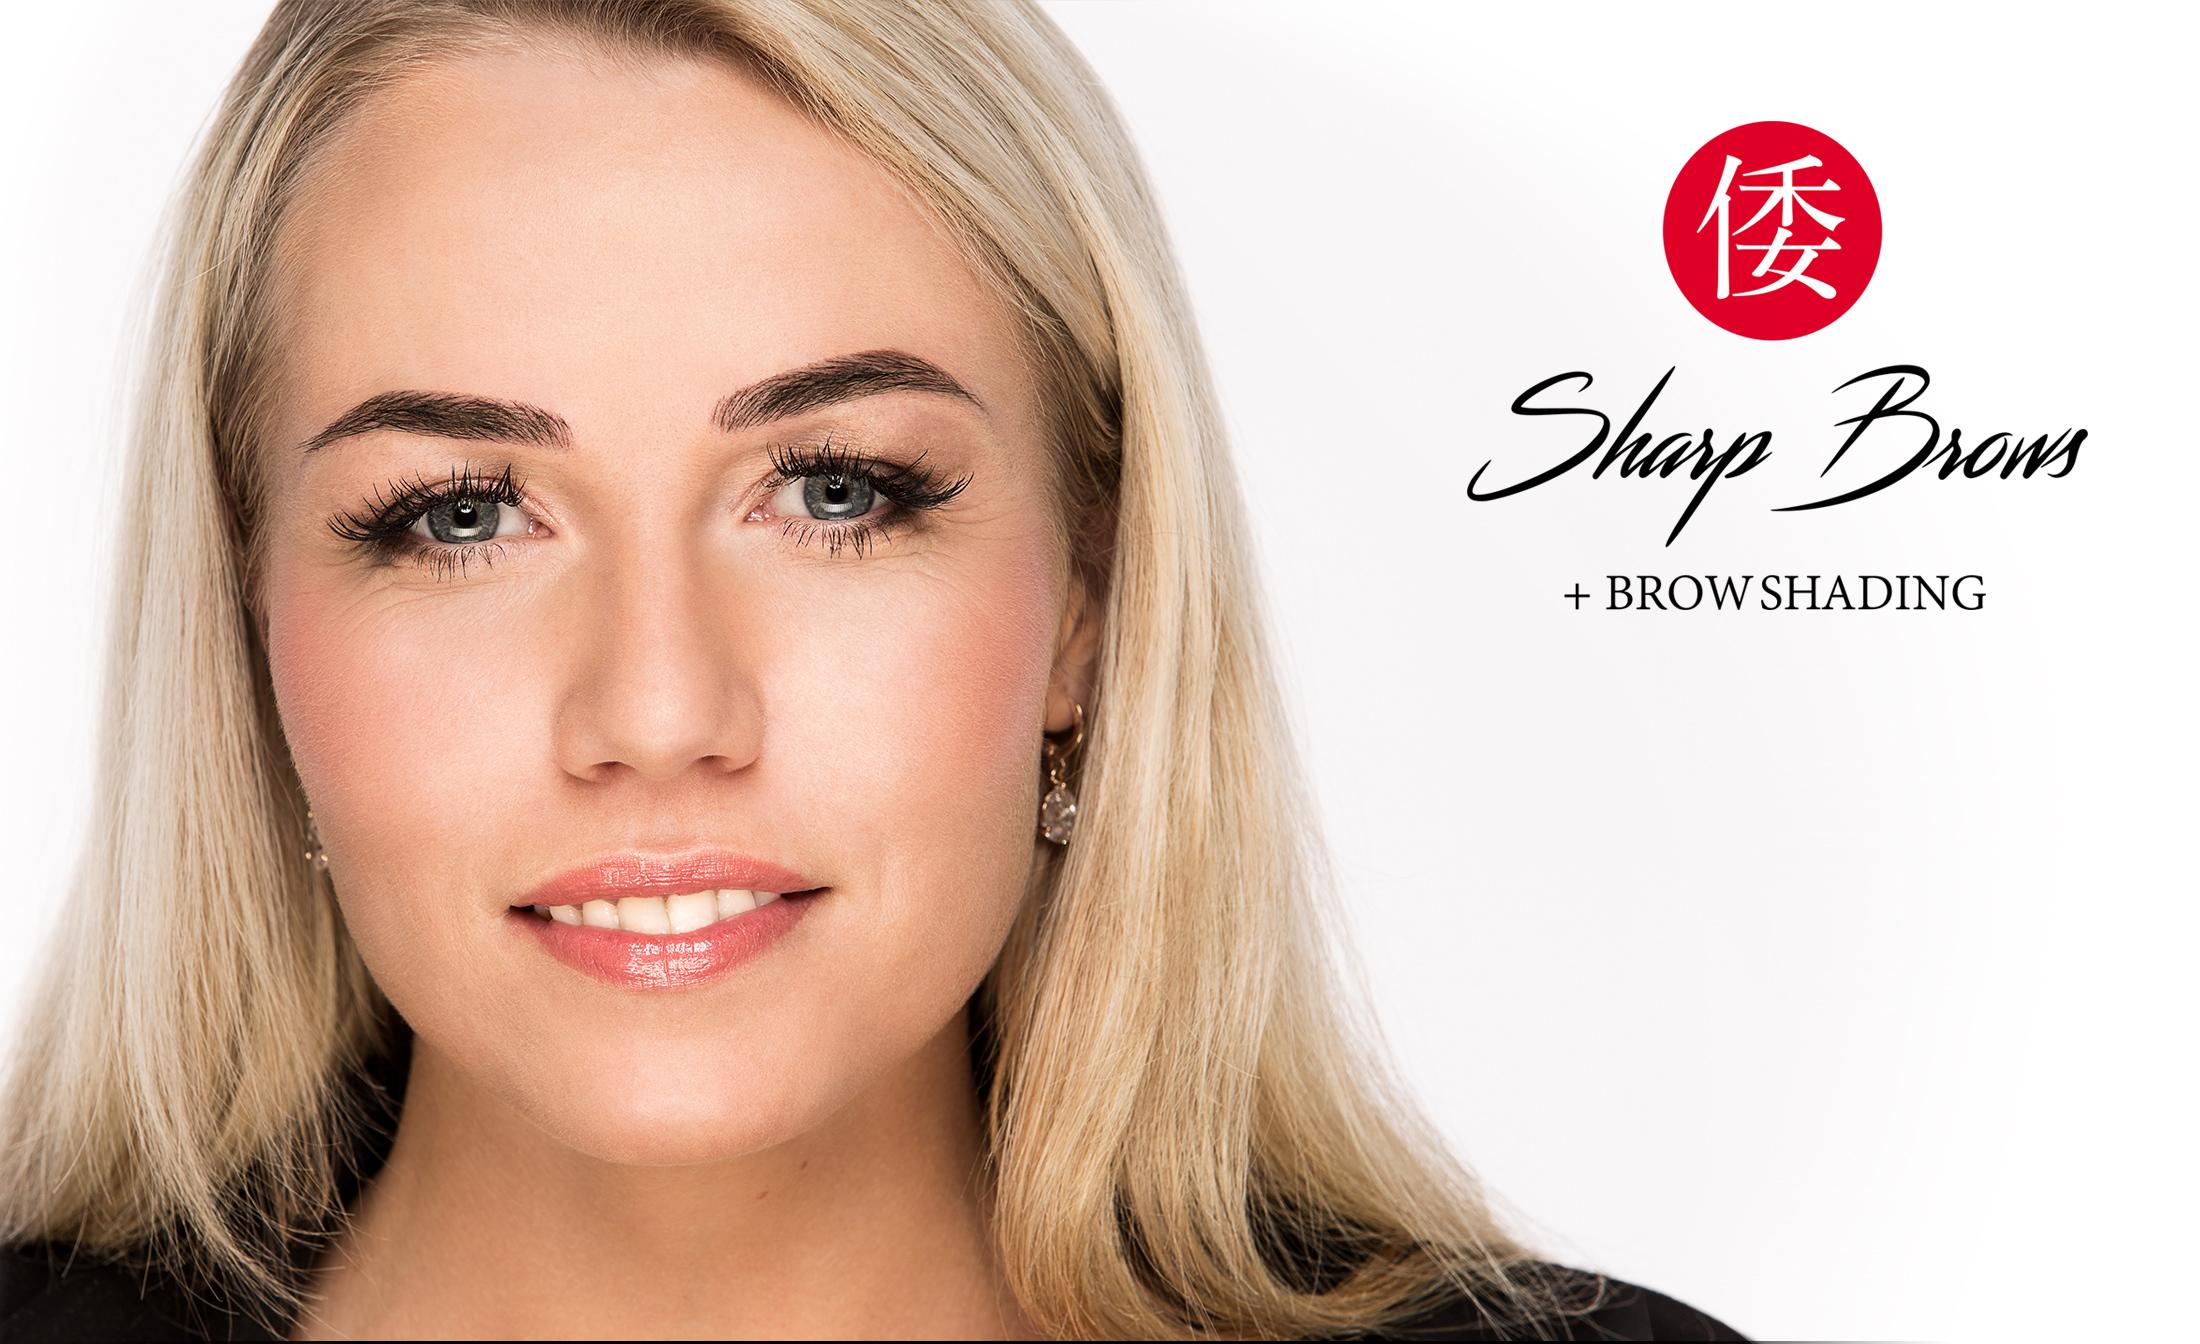 Copyright 2016 SharpBrows + Browshading